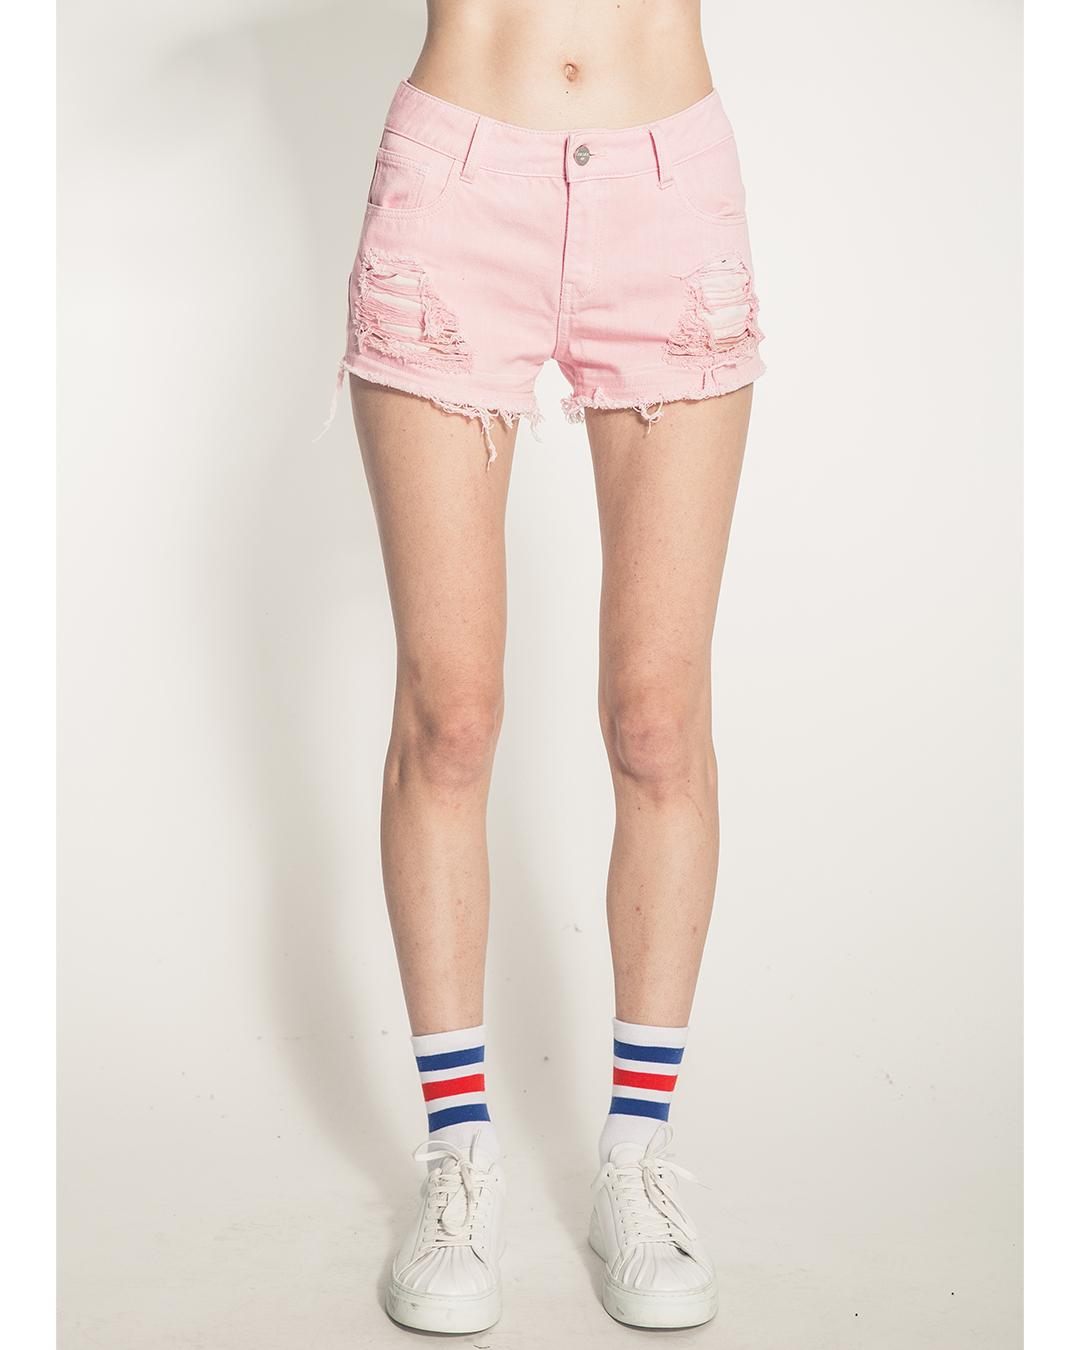 Mistakes Girl's Denim Shorts (Pink)